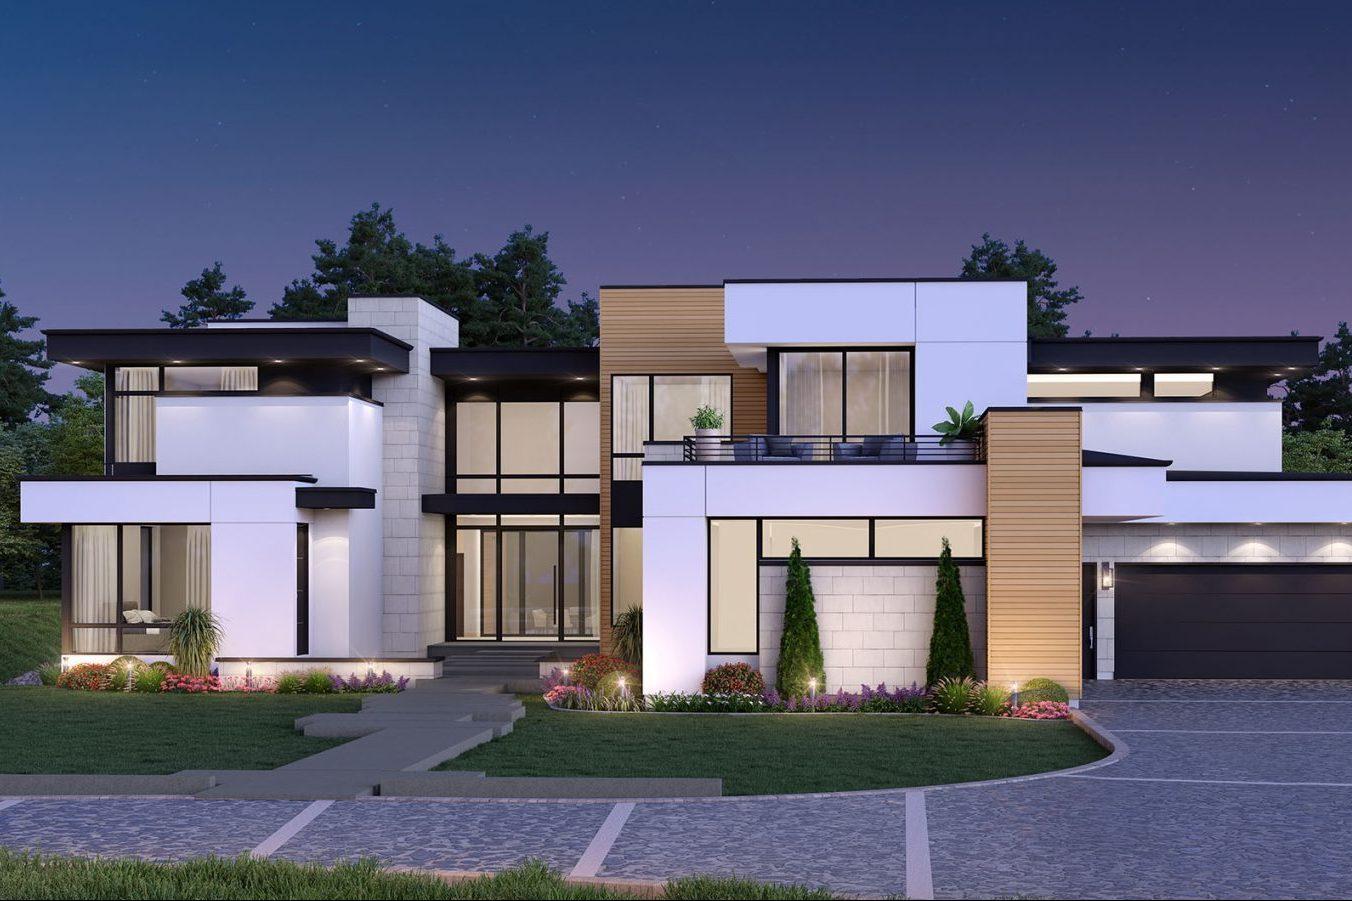 Award-winning modern home designed by Godden Sudik Architects